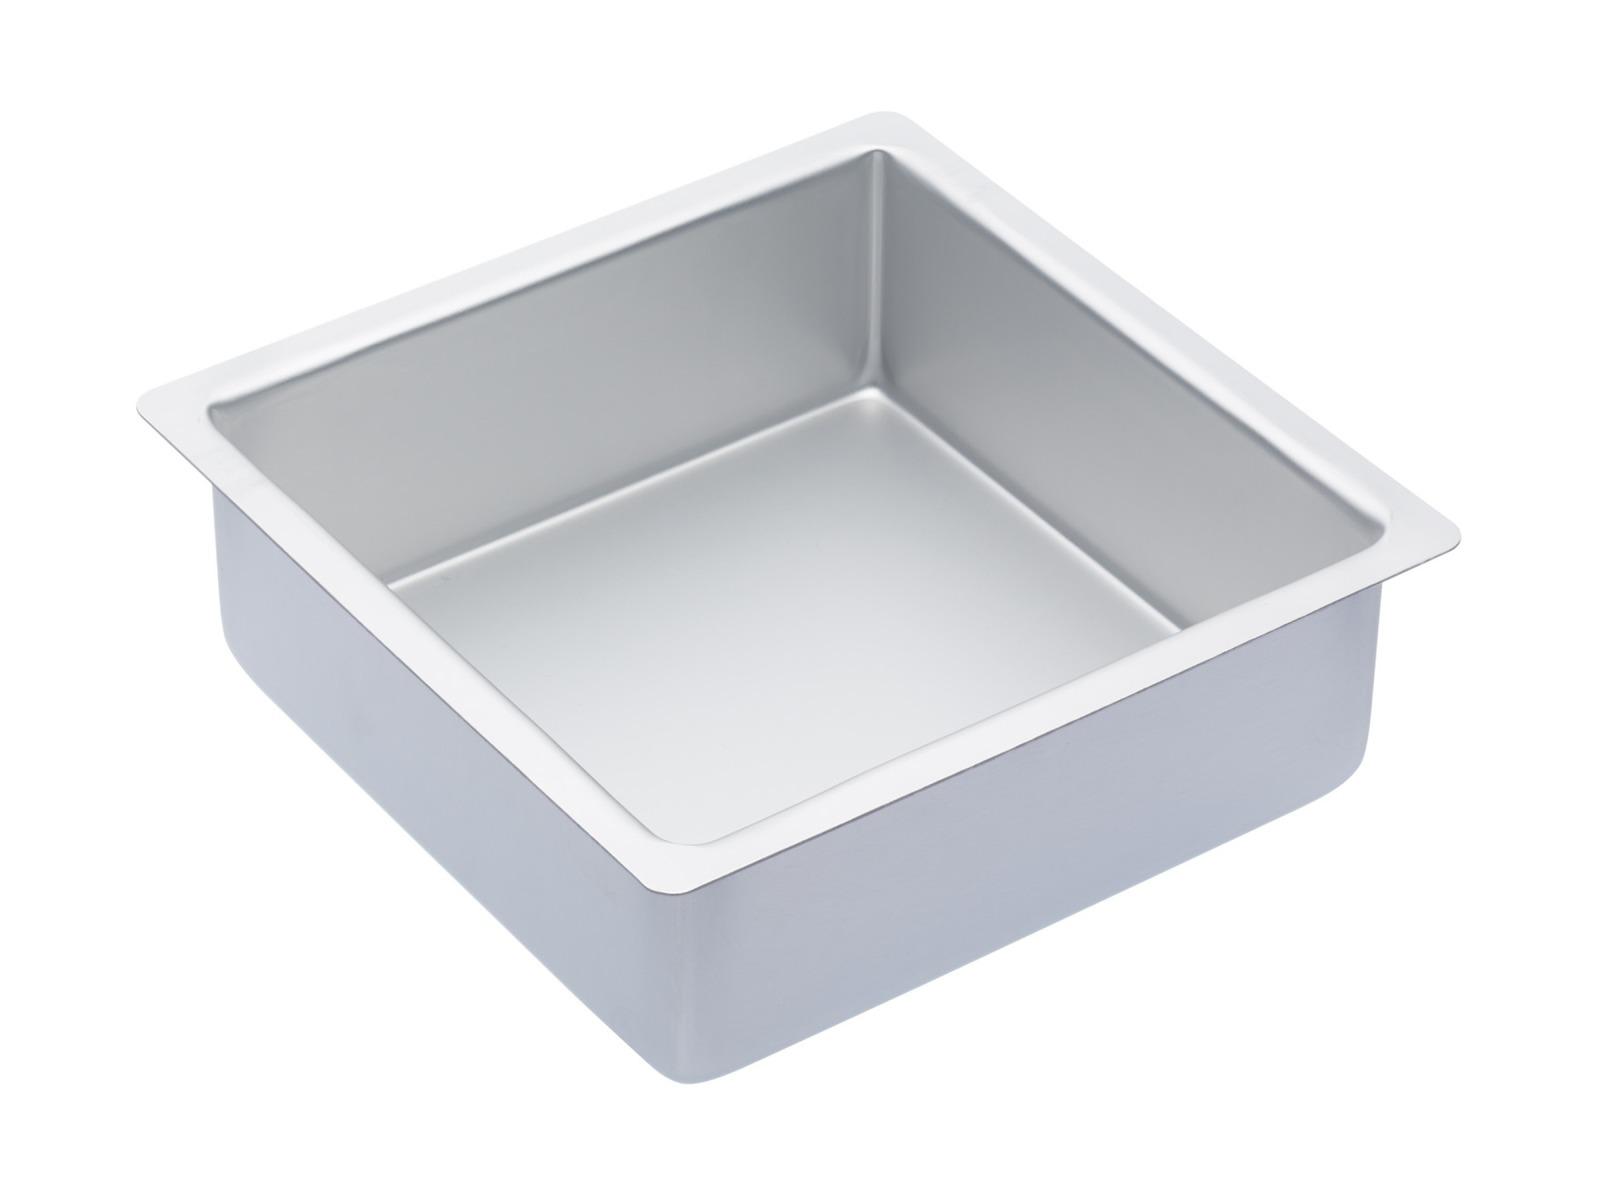 MasterClass: Silver Anodised Square Deep Cake Pan (20cm) image